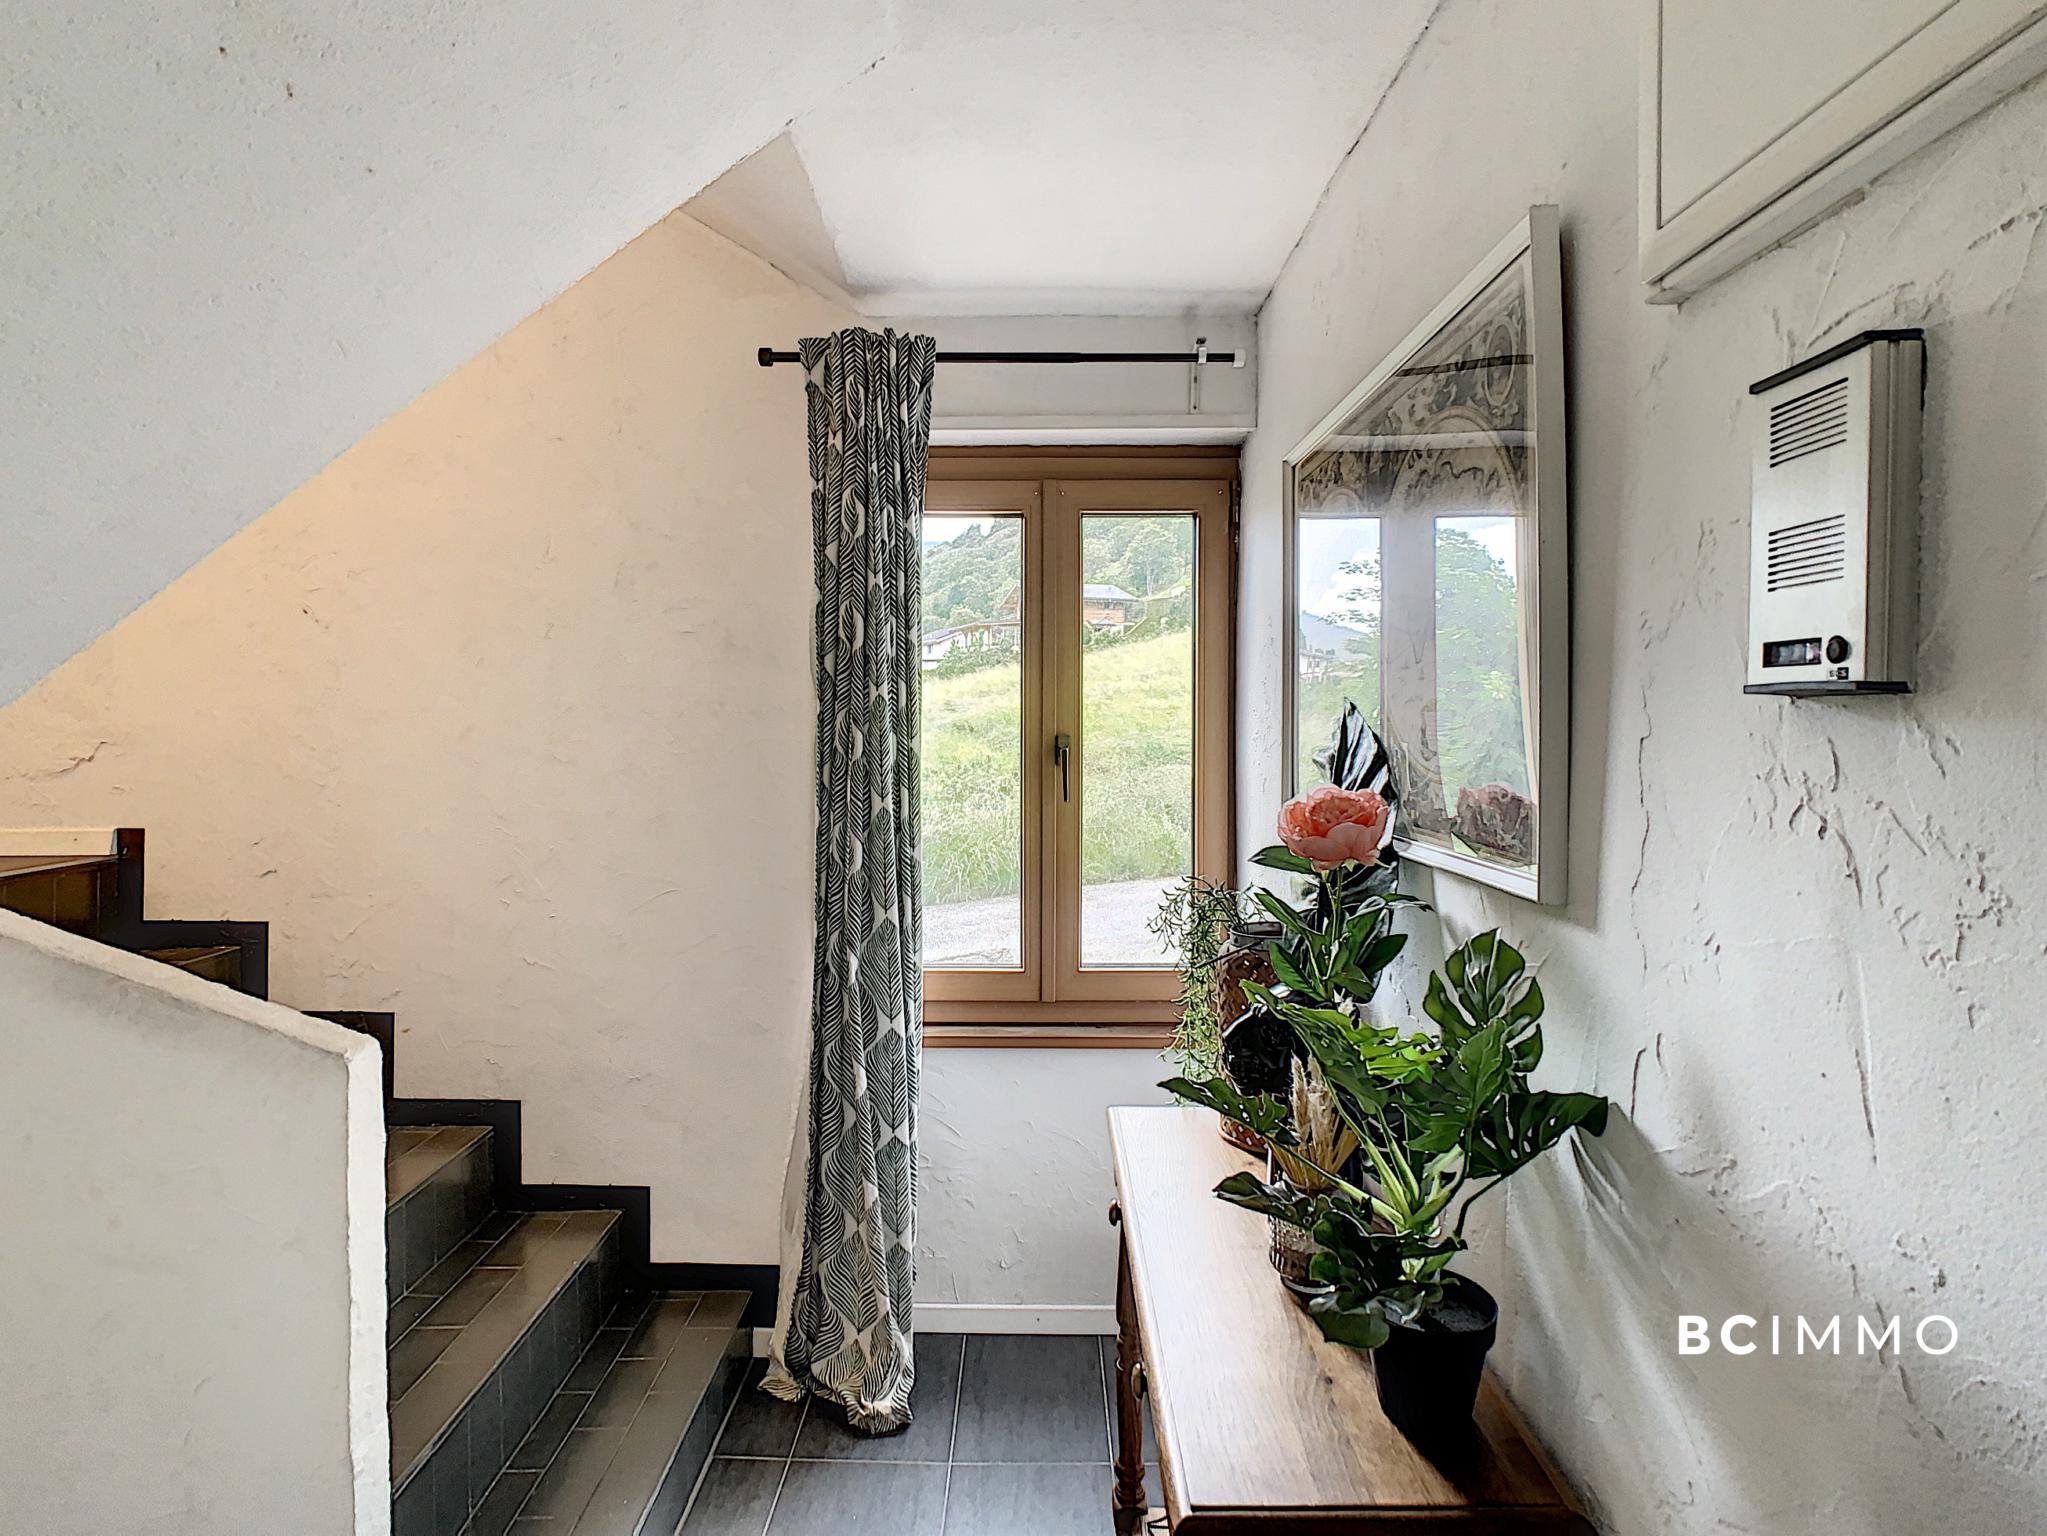 BC Immo - Charmante maison villageoise rénovée  - DCMLP1976